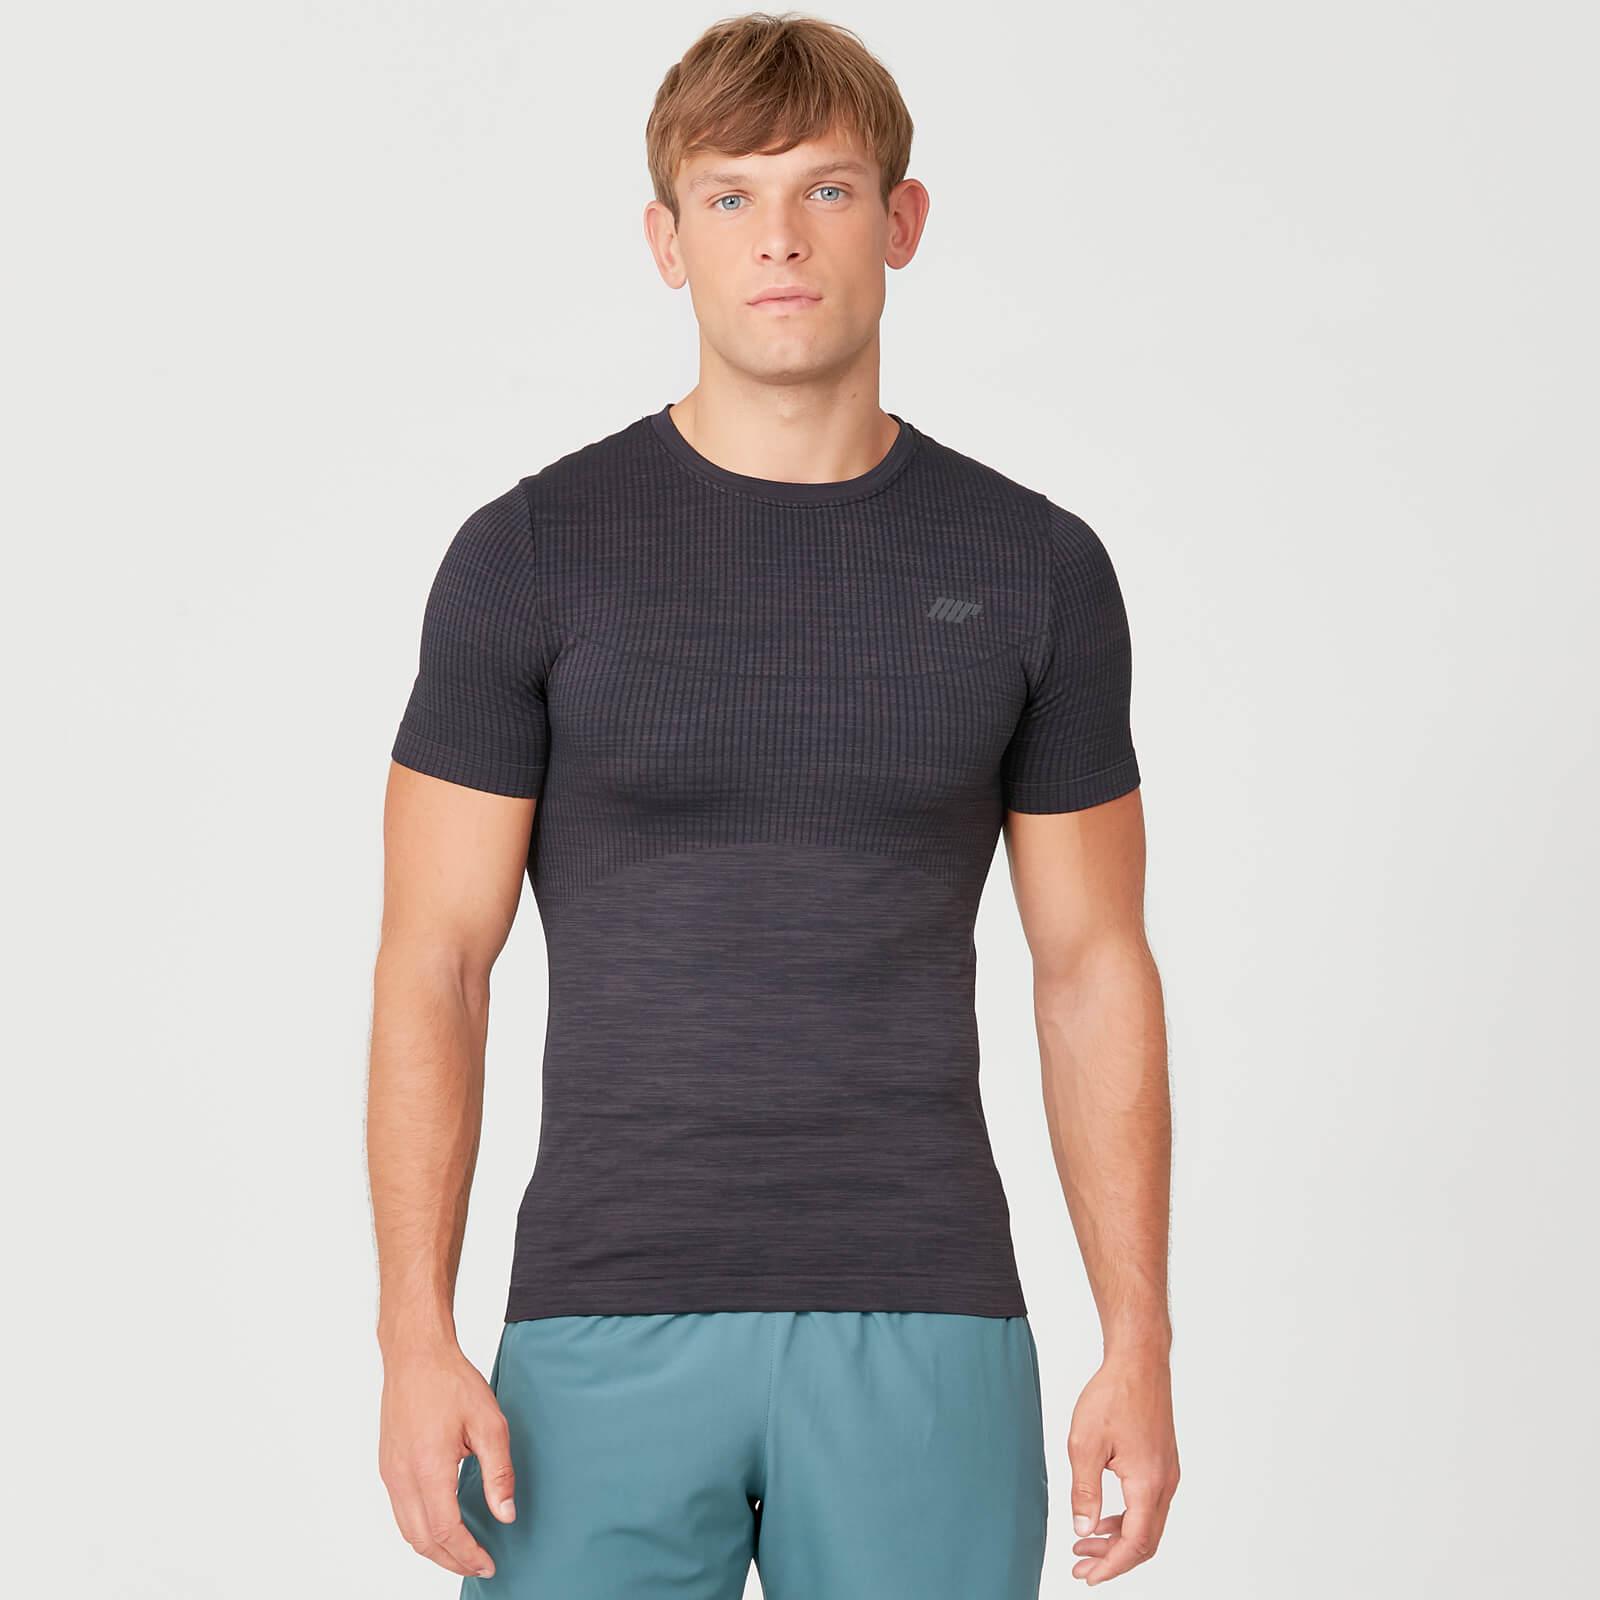 Myprotein Seamless T-Shirt - Slate - S